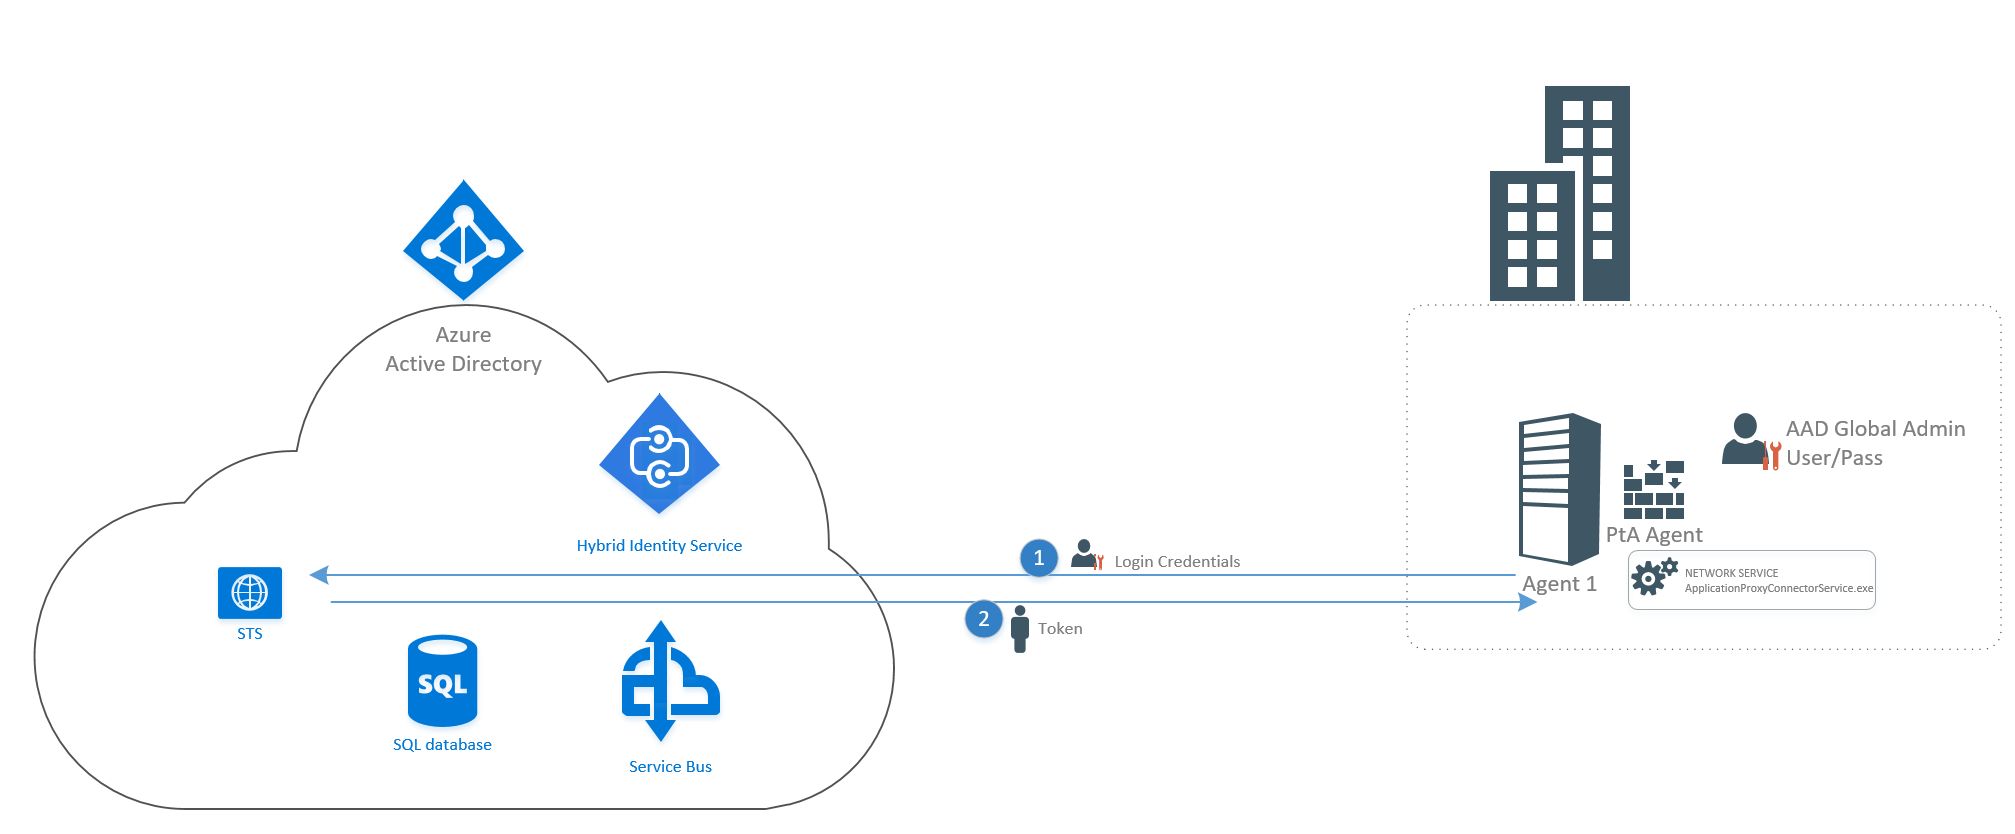 Azure Active Directory Pass-through Authentication part 2 –